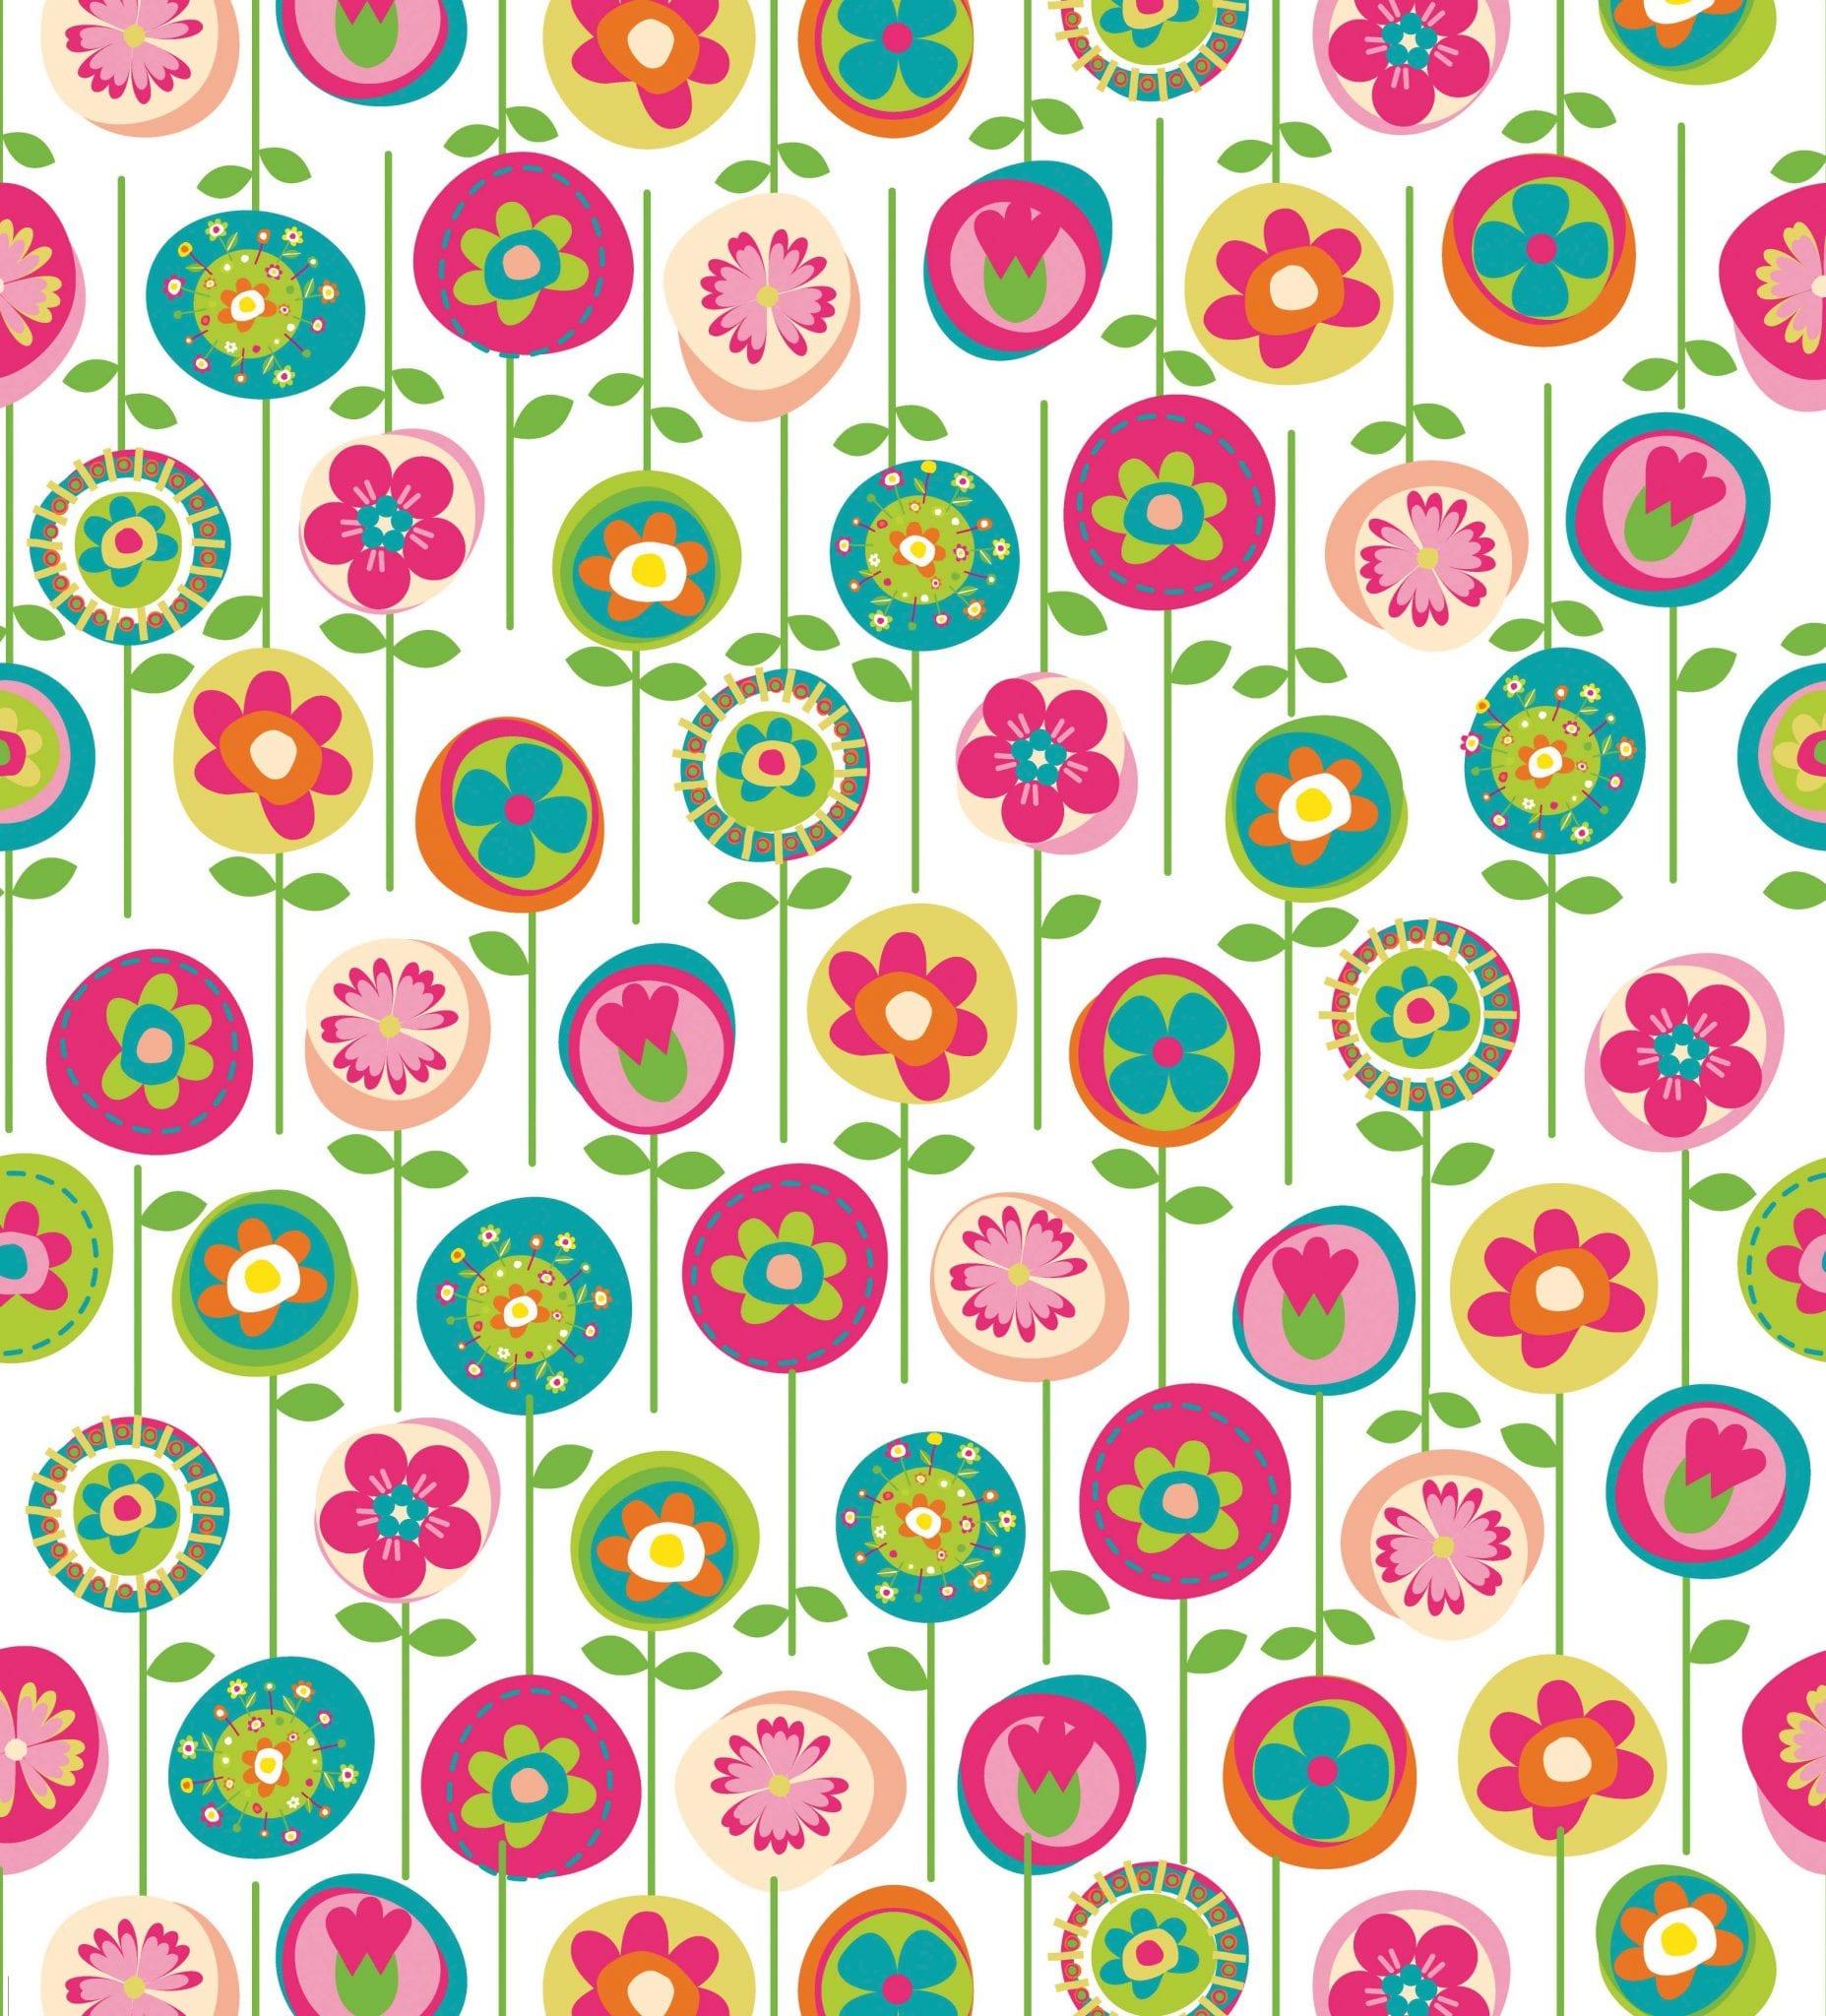 Papel mural infantil flores 9924-1 Muresco